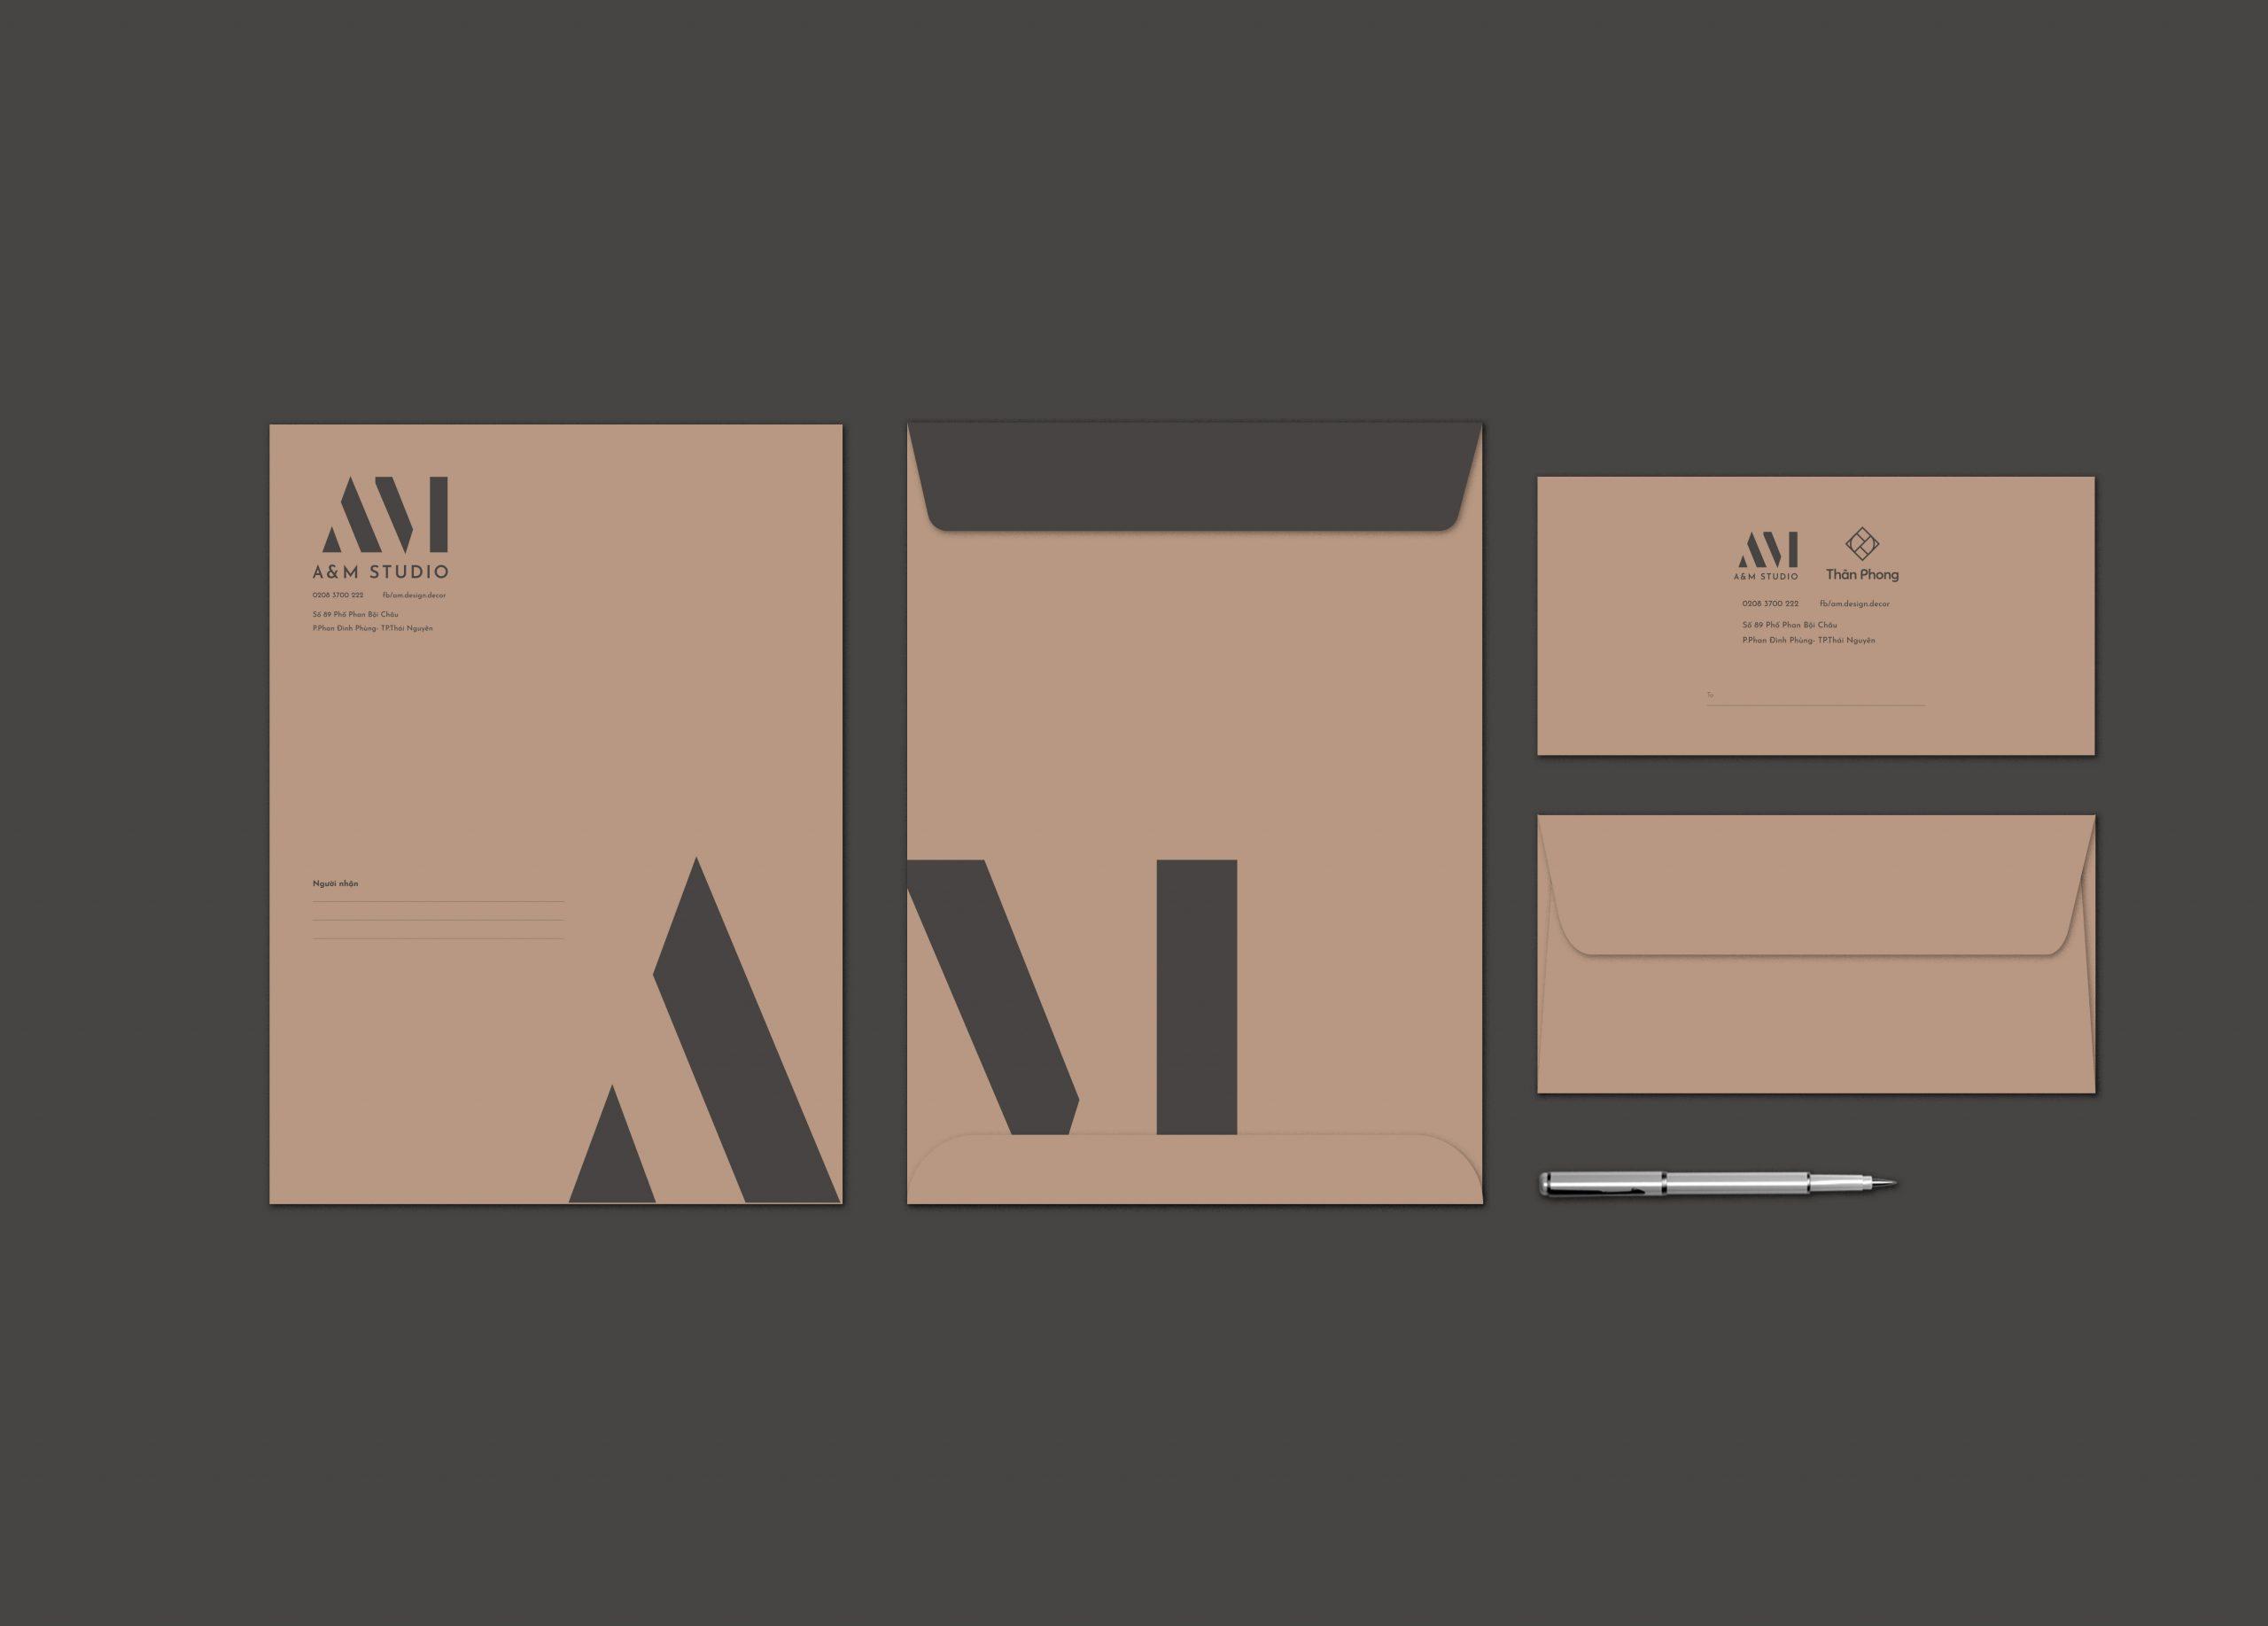 AM_phongbi x folder